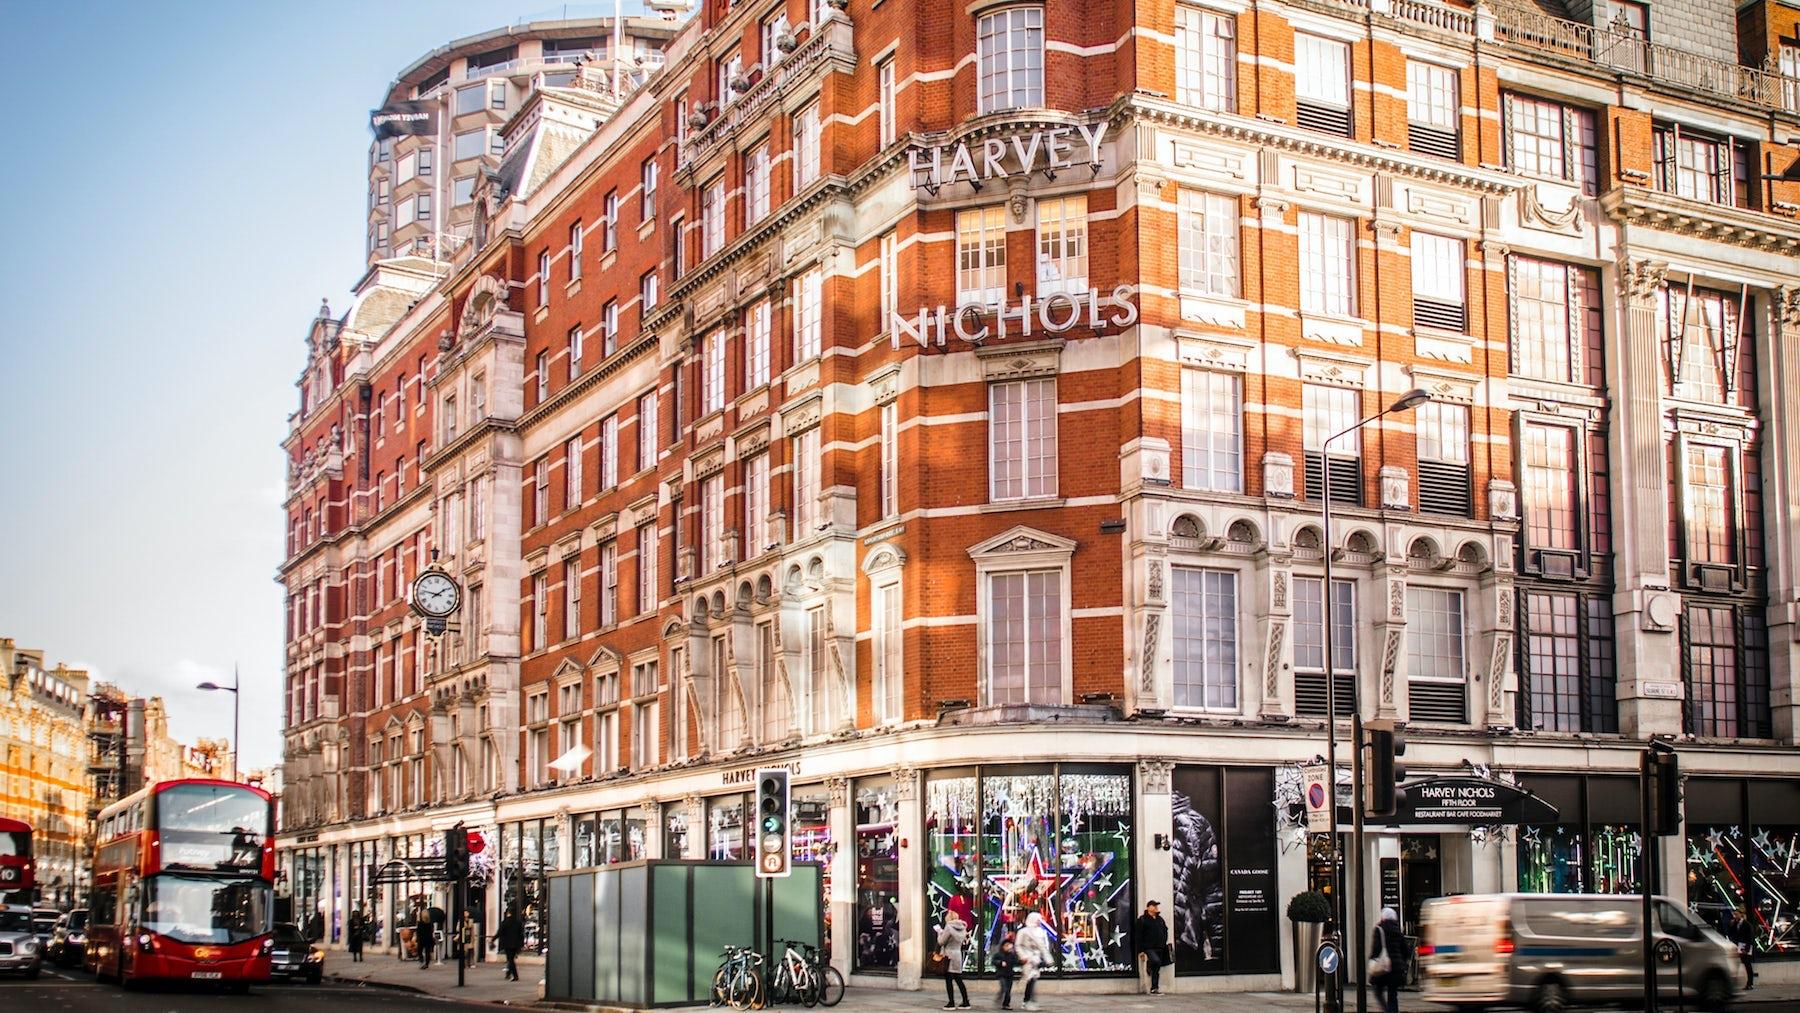 Harvey Nichols\' flagship store in Knightsbridge. Shutterstock.